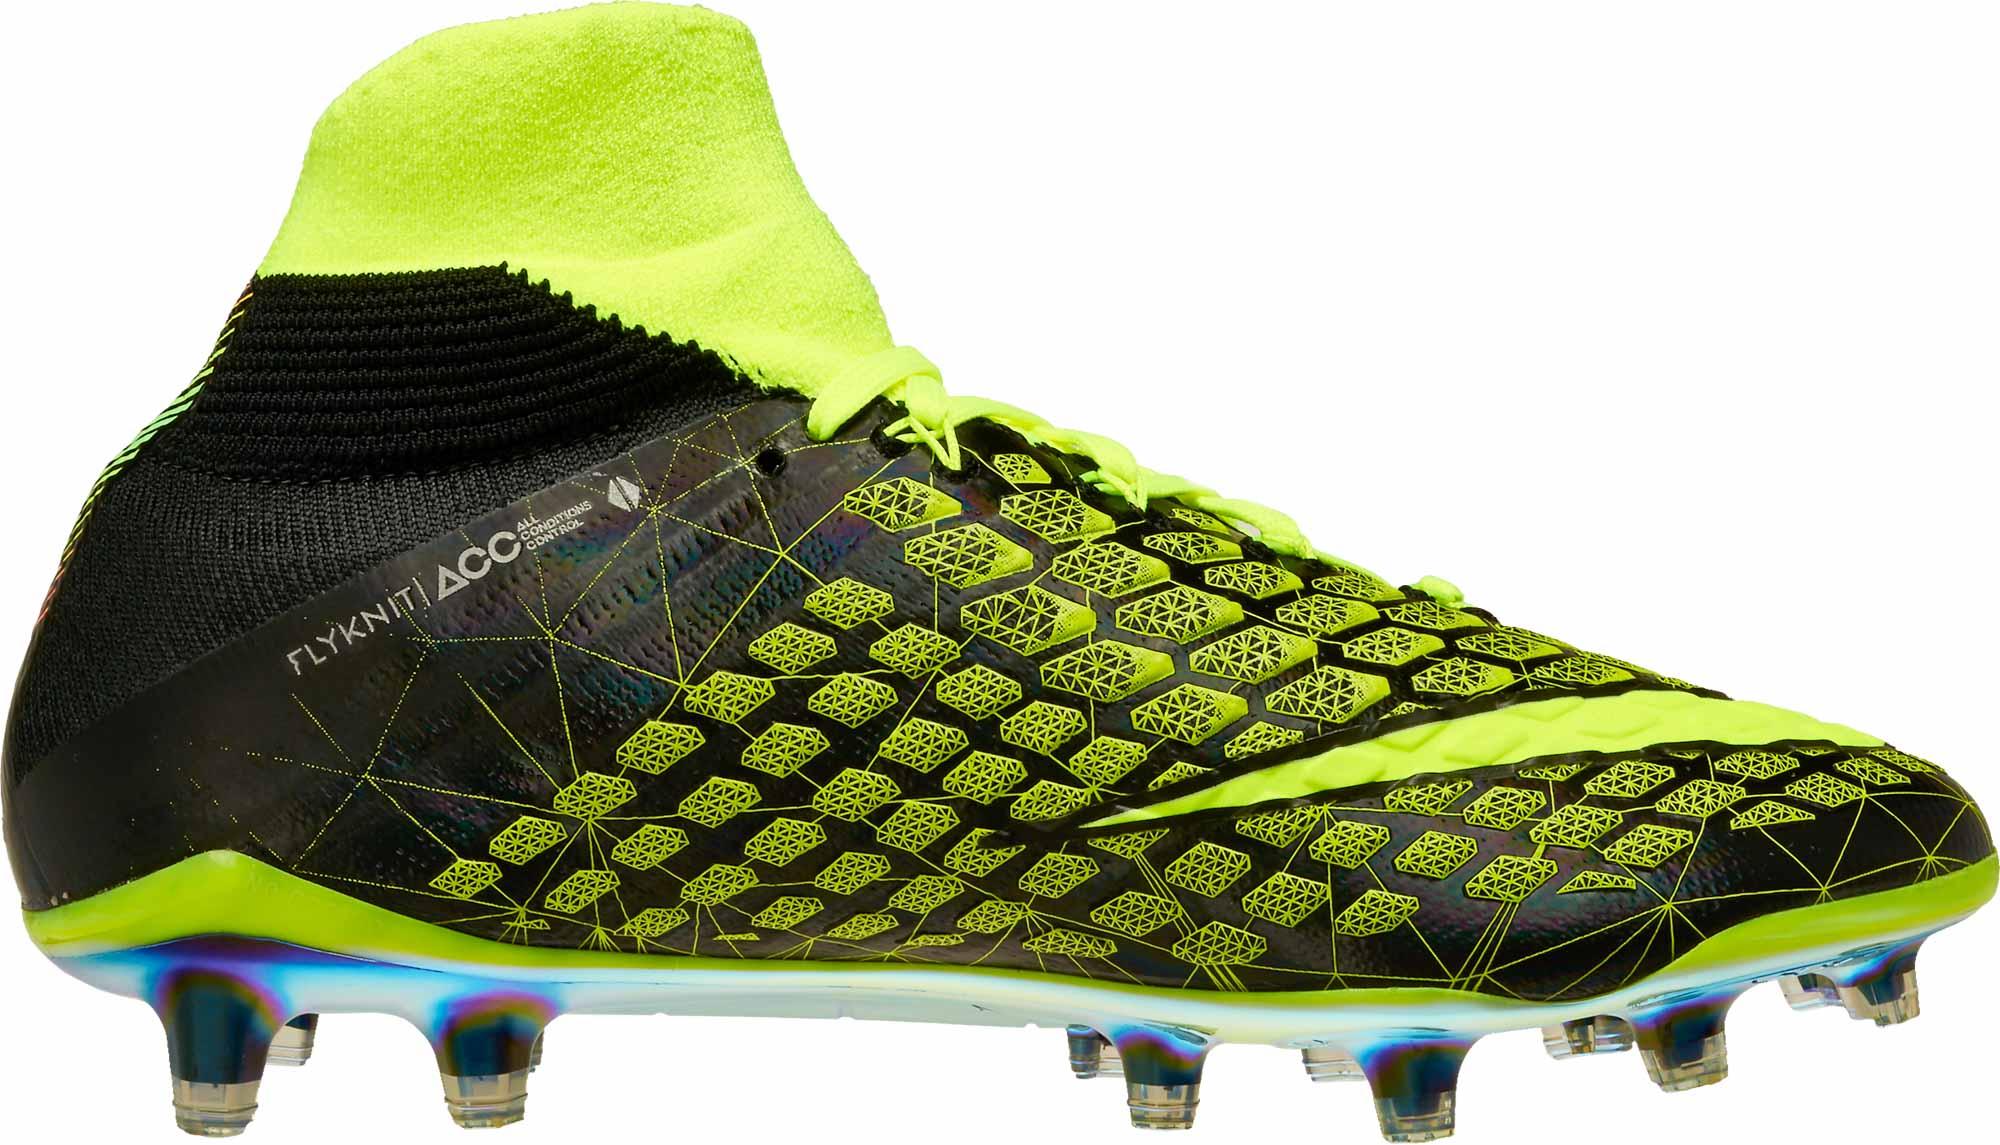 c415337bc87 Nike Hypervenom Phantom III DF FG – EA Sports – Volt Black